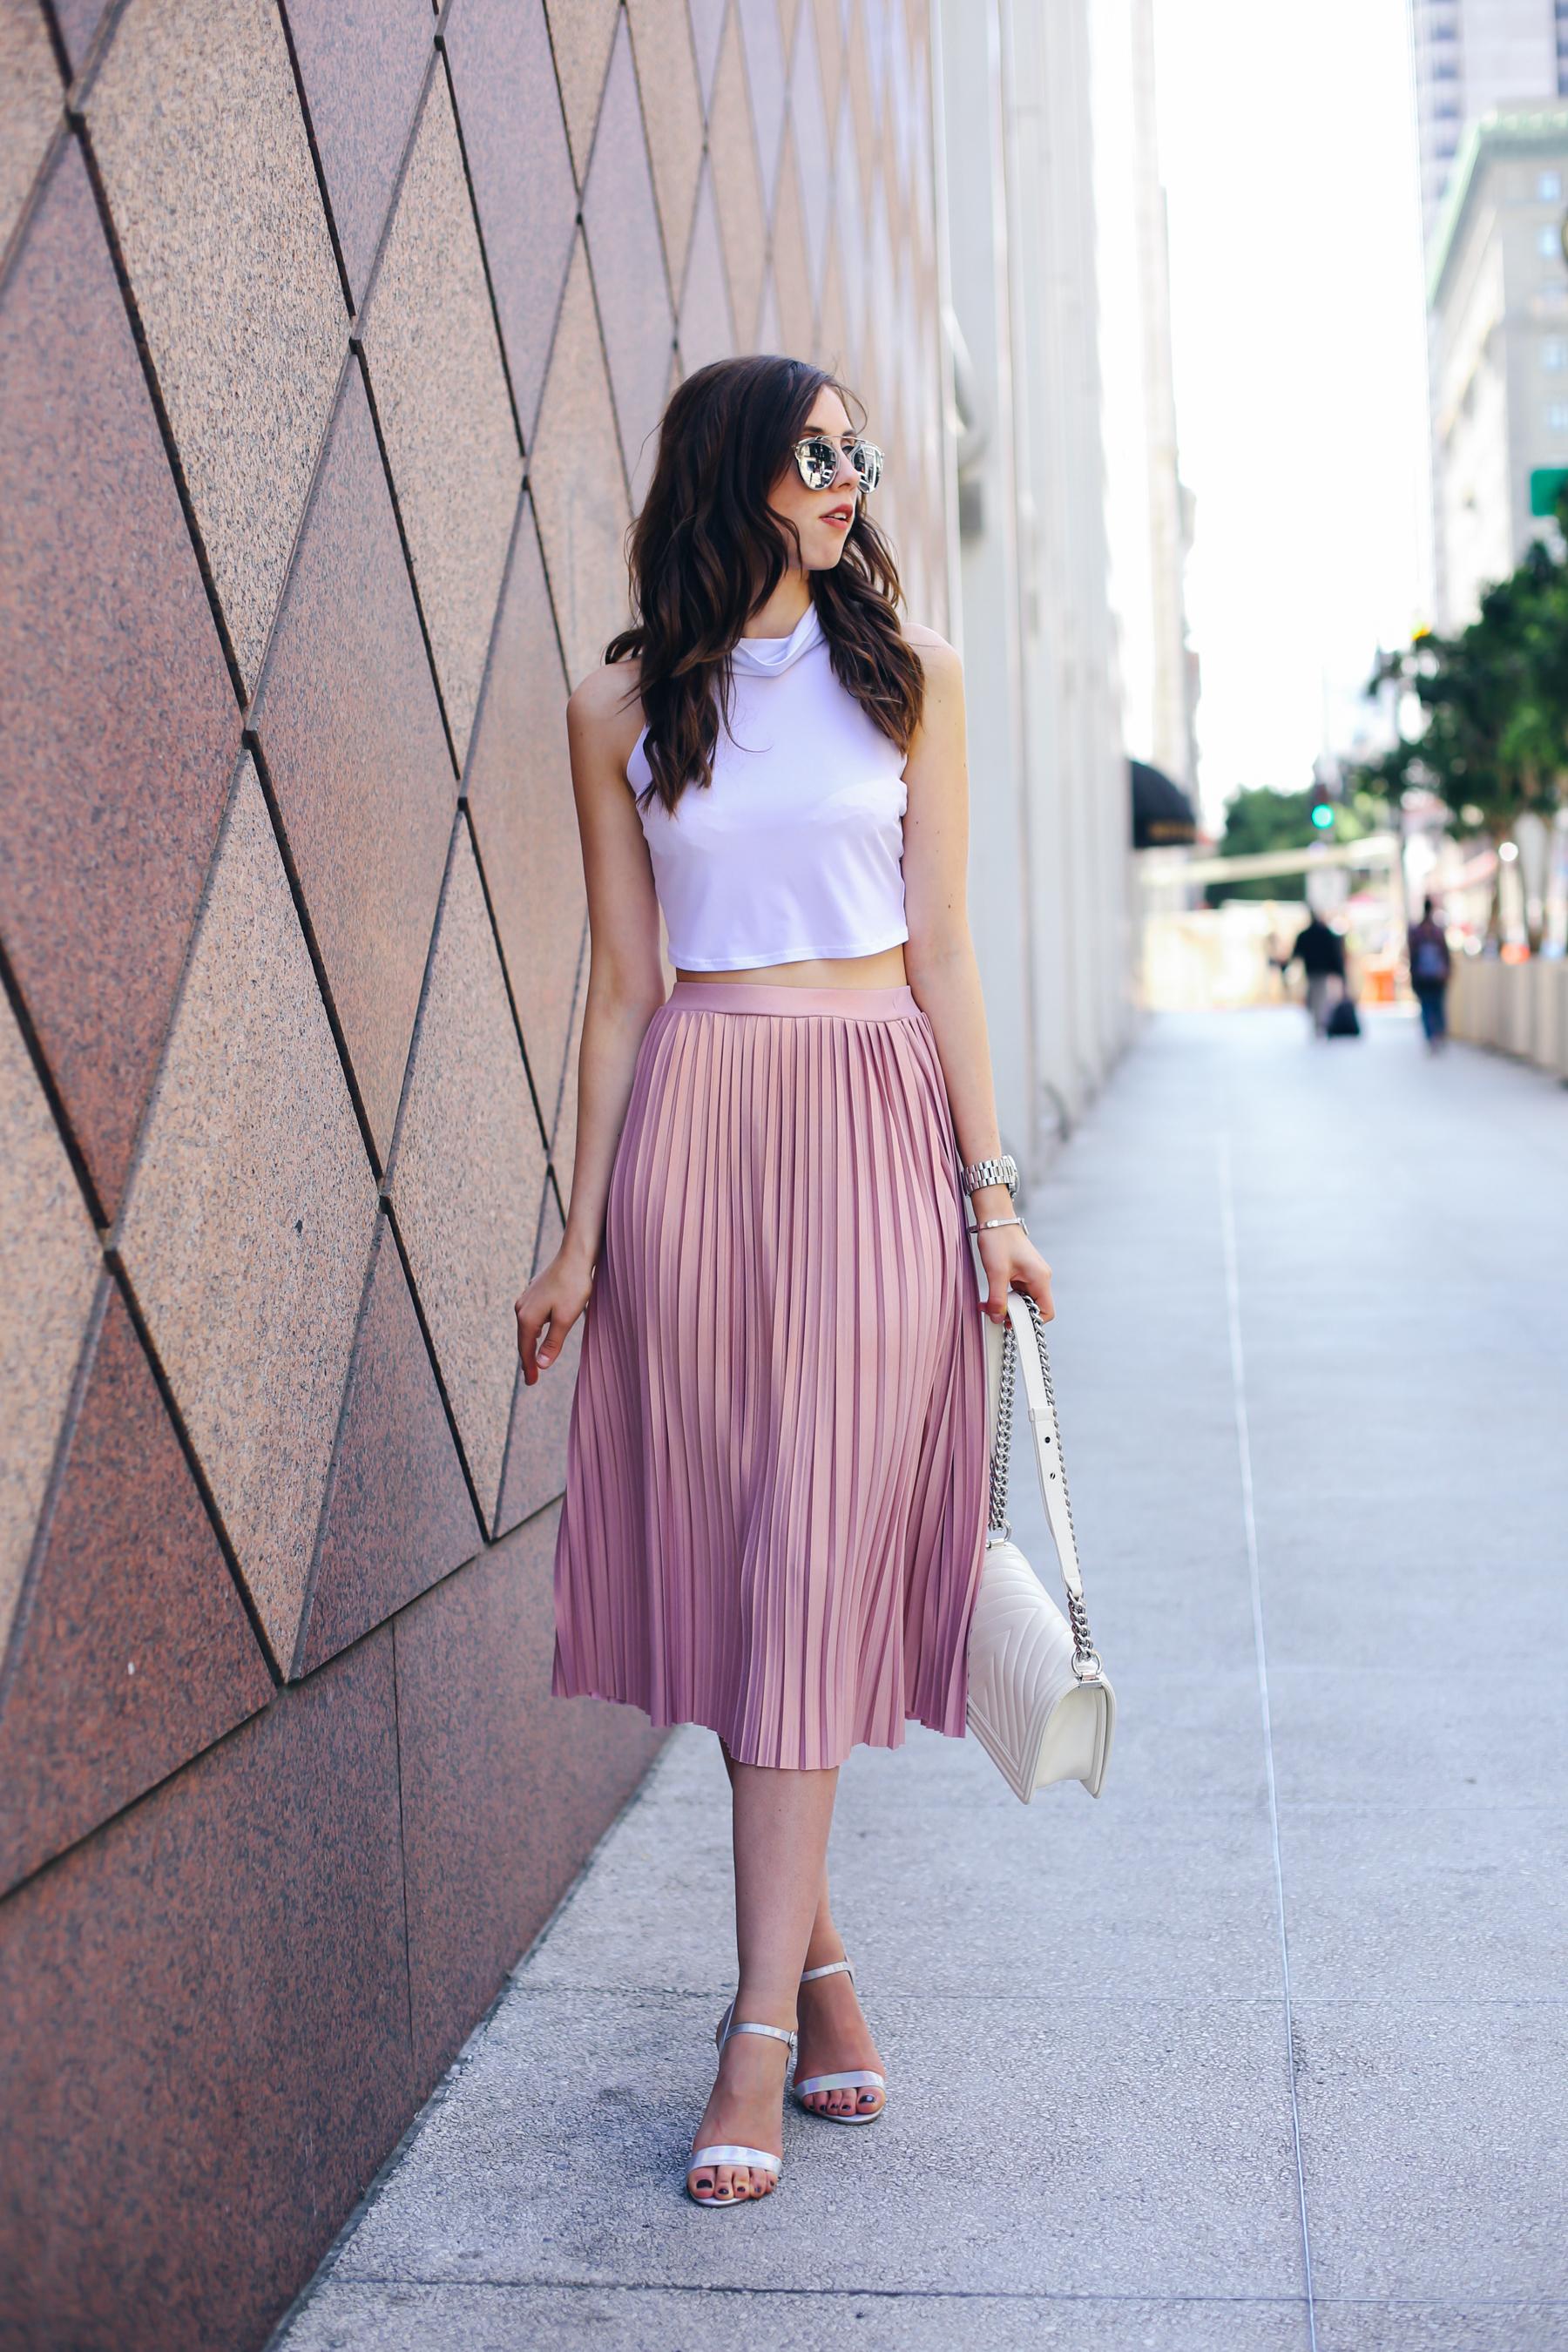 Barbora-Ondracova-FashioninmySoul-Fashion-Blogger-Photography-RyanbyRyanChua-7759 (1)